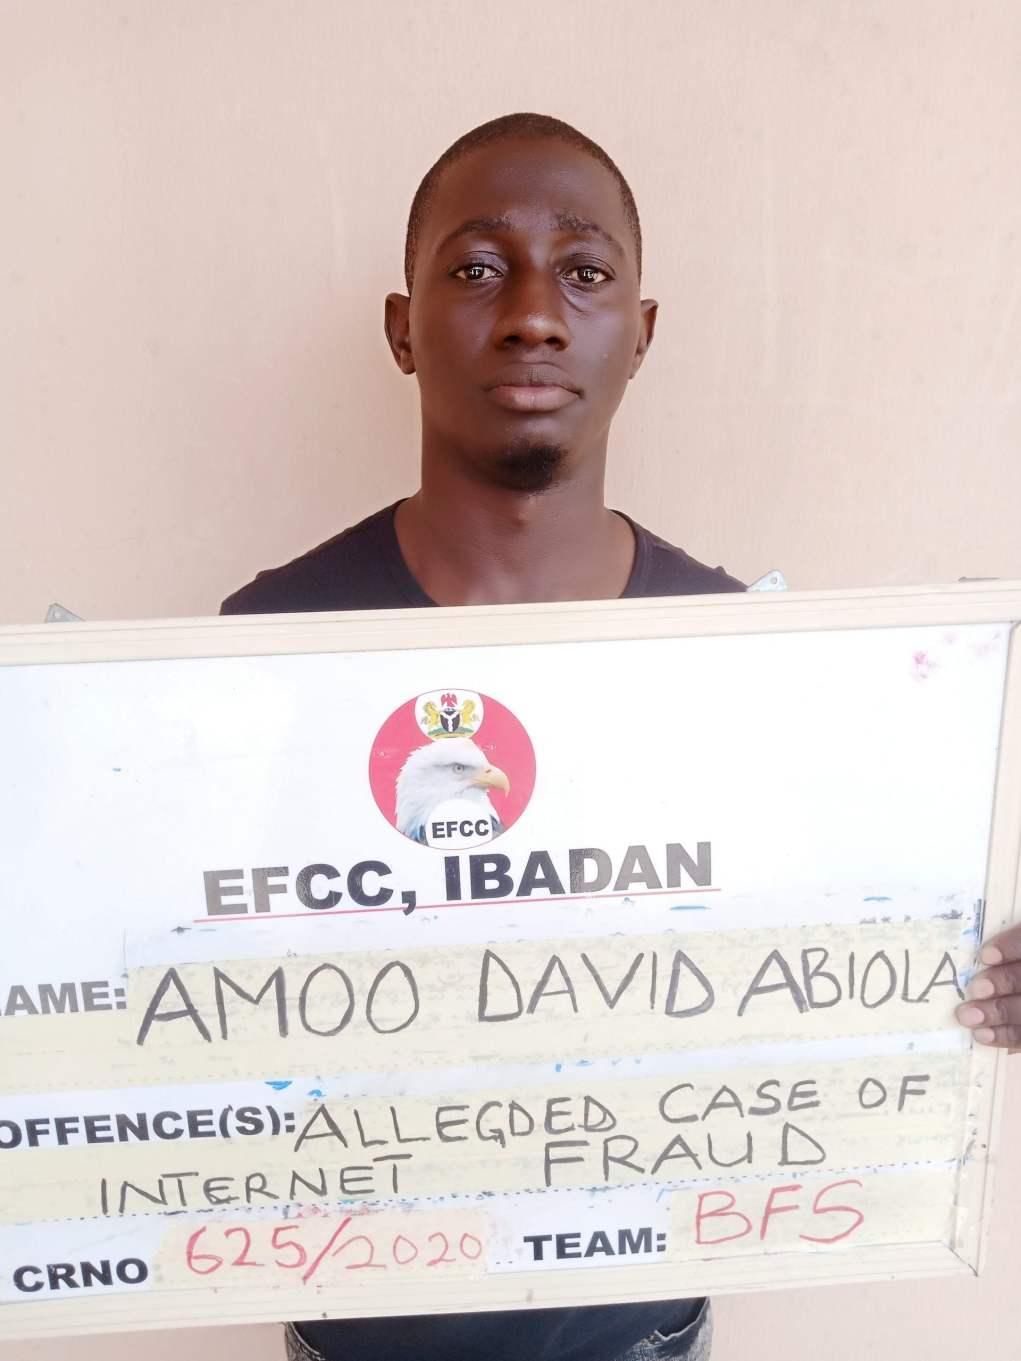 Fraudsters convicted in Ibadan – Daily Post Nigeria